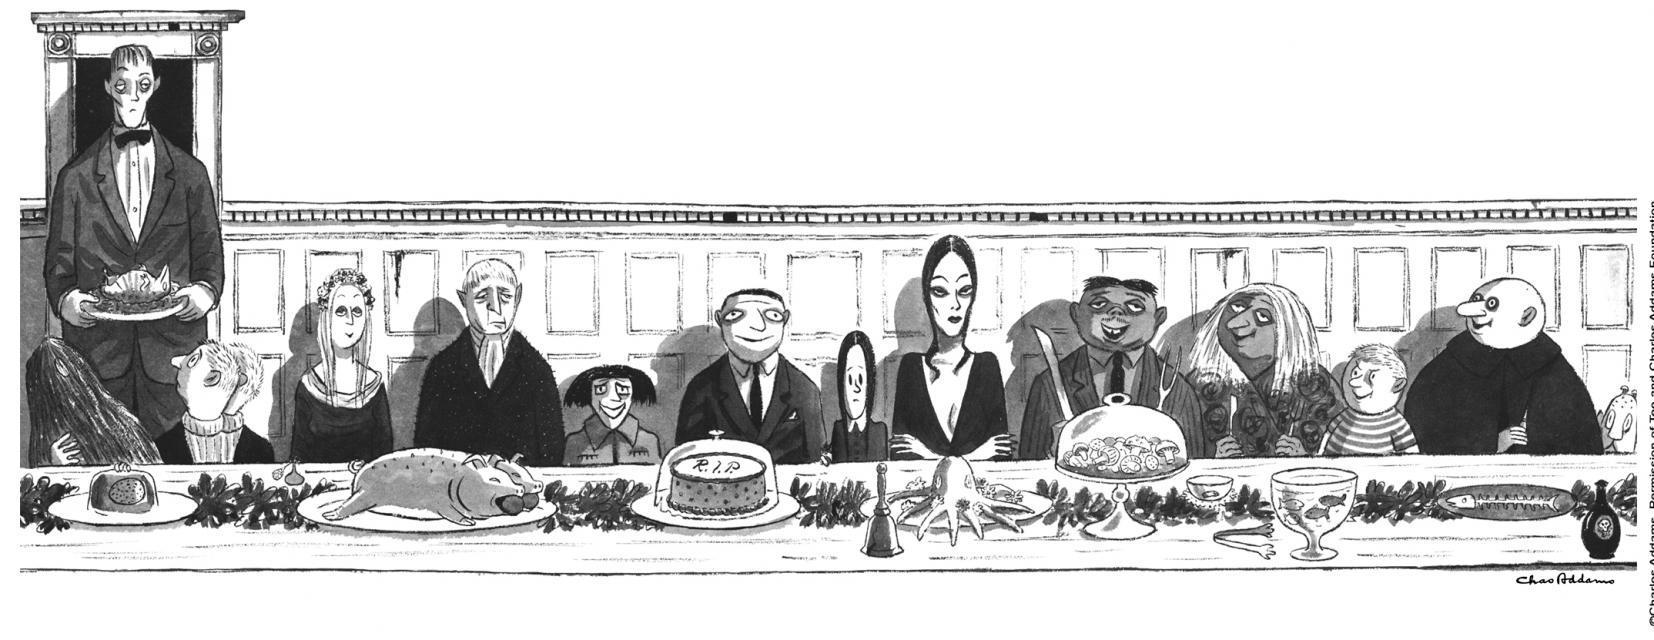 Illustration de la famille Addams par Charles Addams.